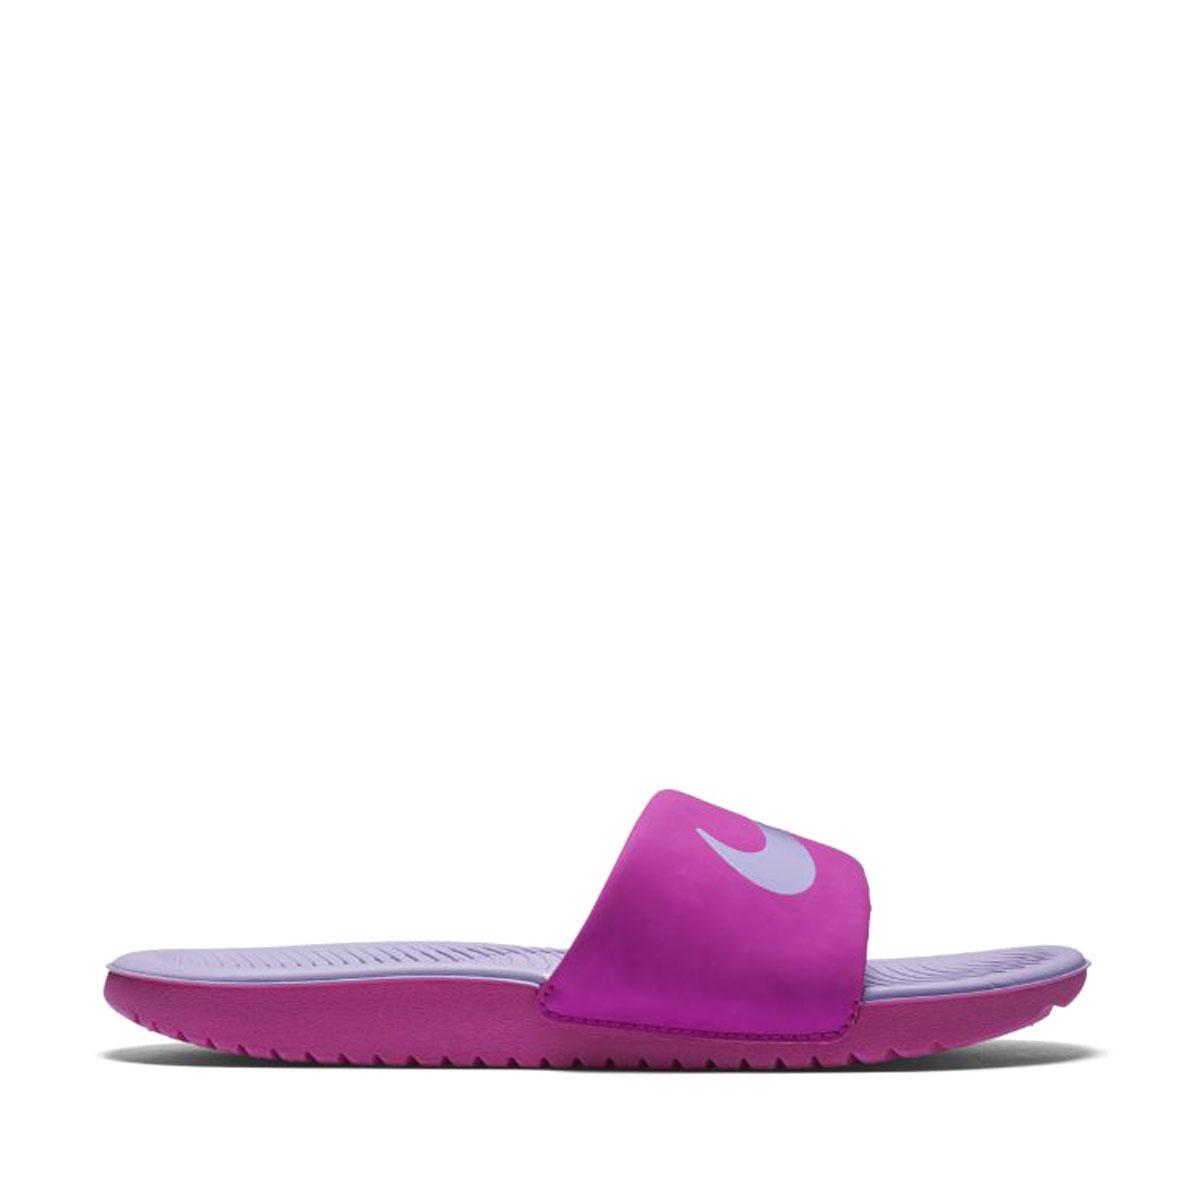 dd6d8a487 atmos pink  NIKE KAWA SLIDE (GS PS) (Nike kava slide GS PS) FIRE ...